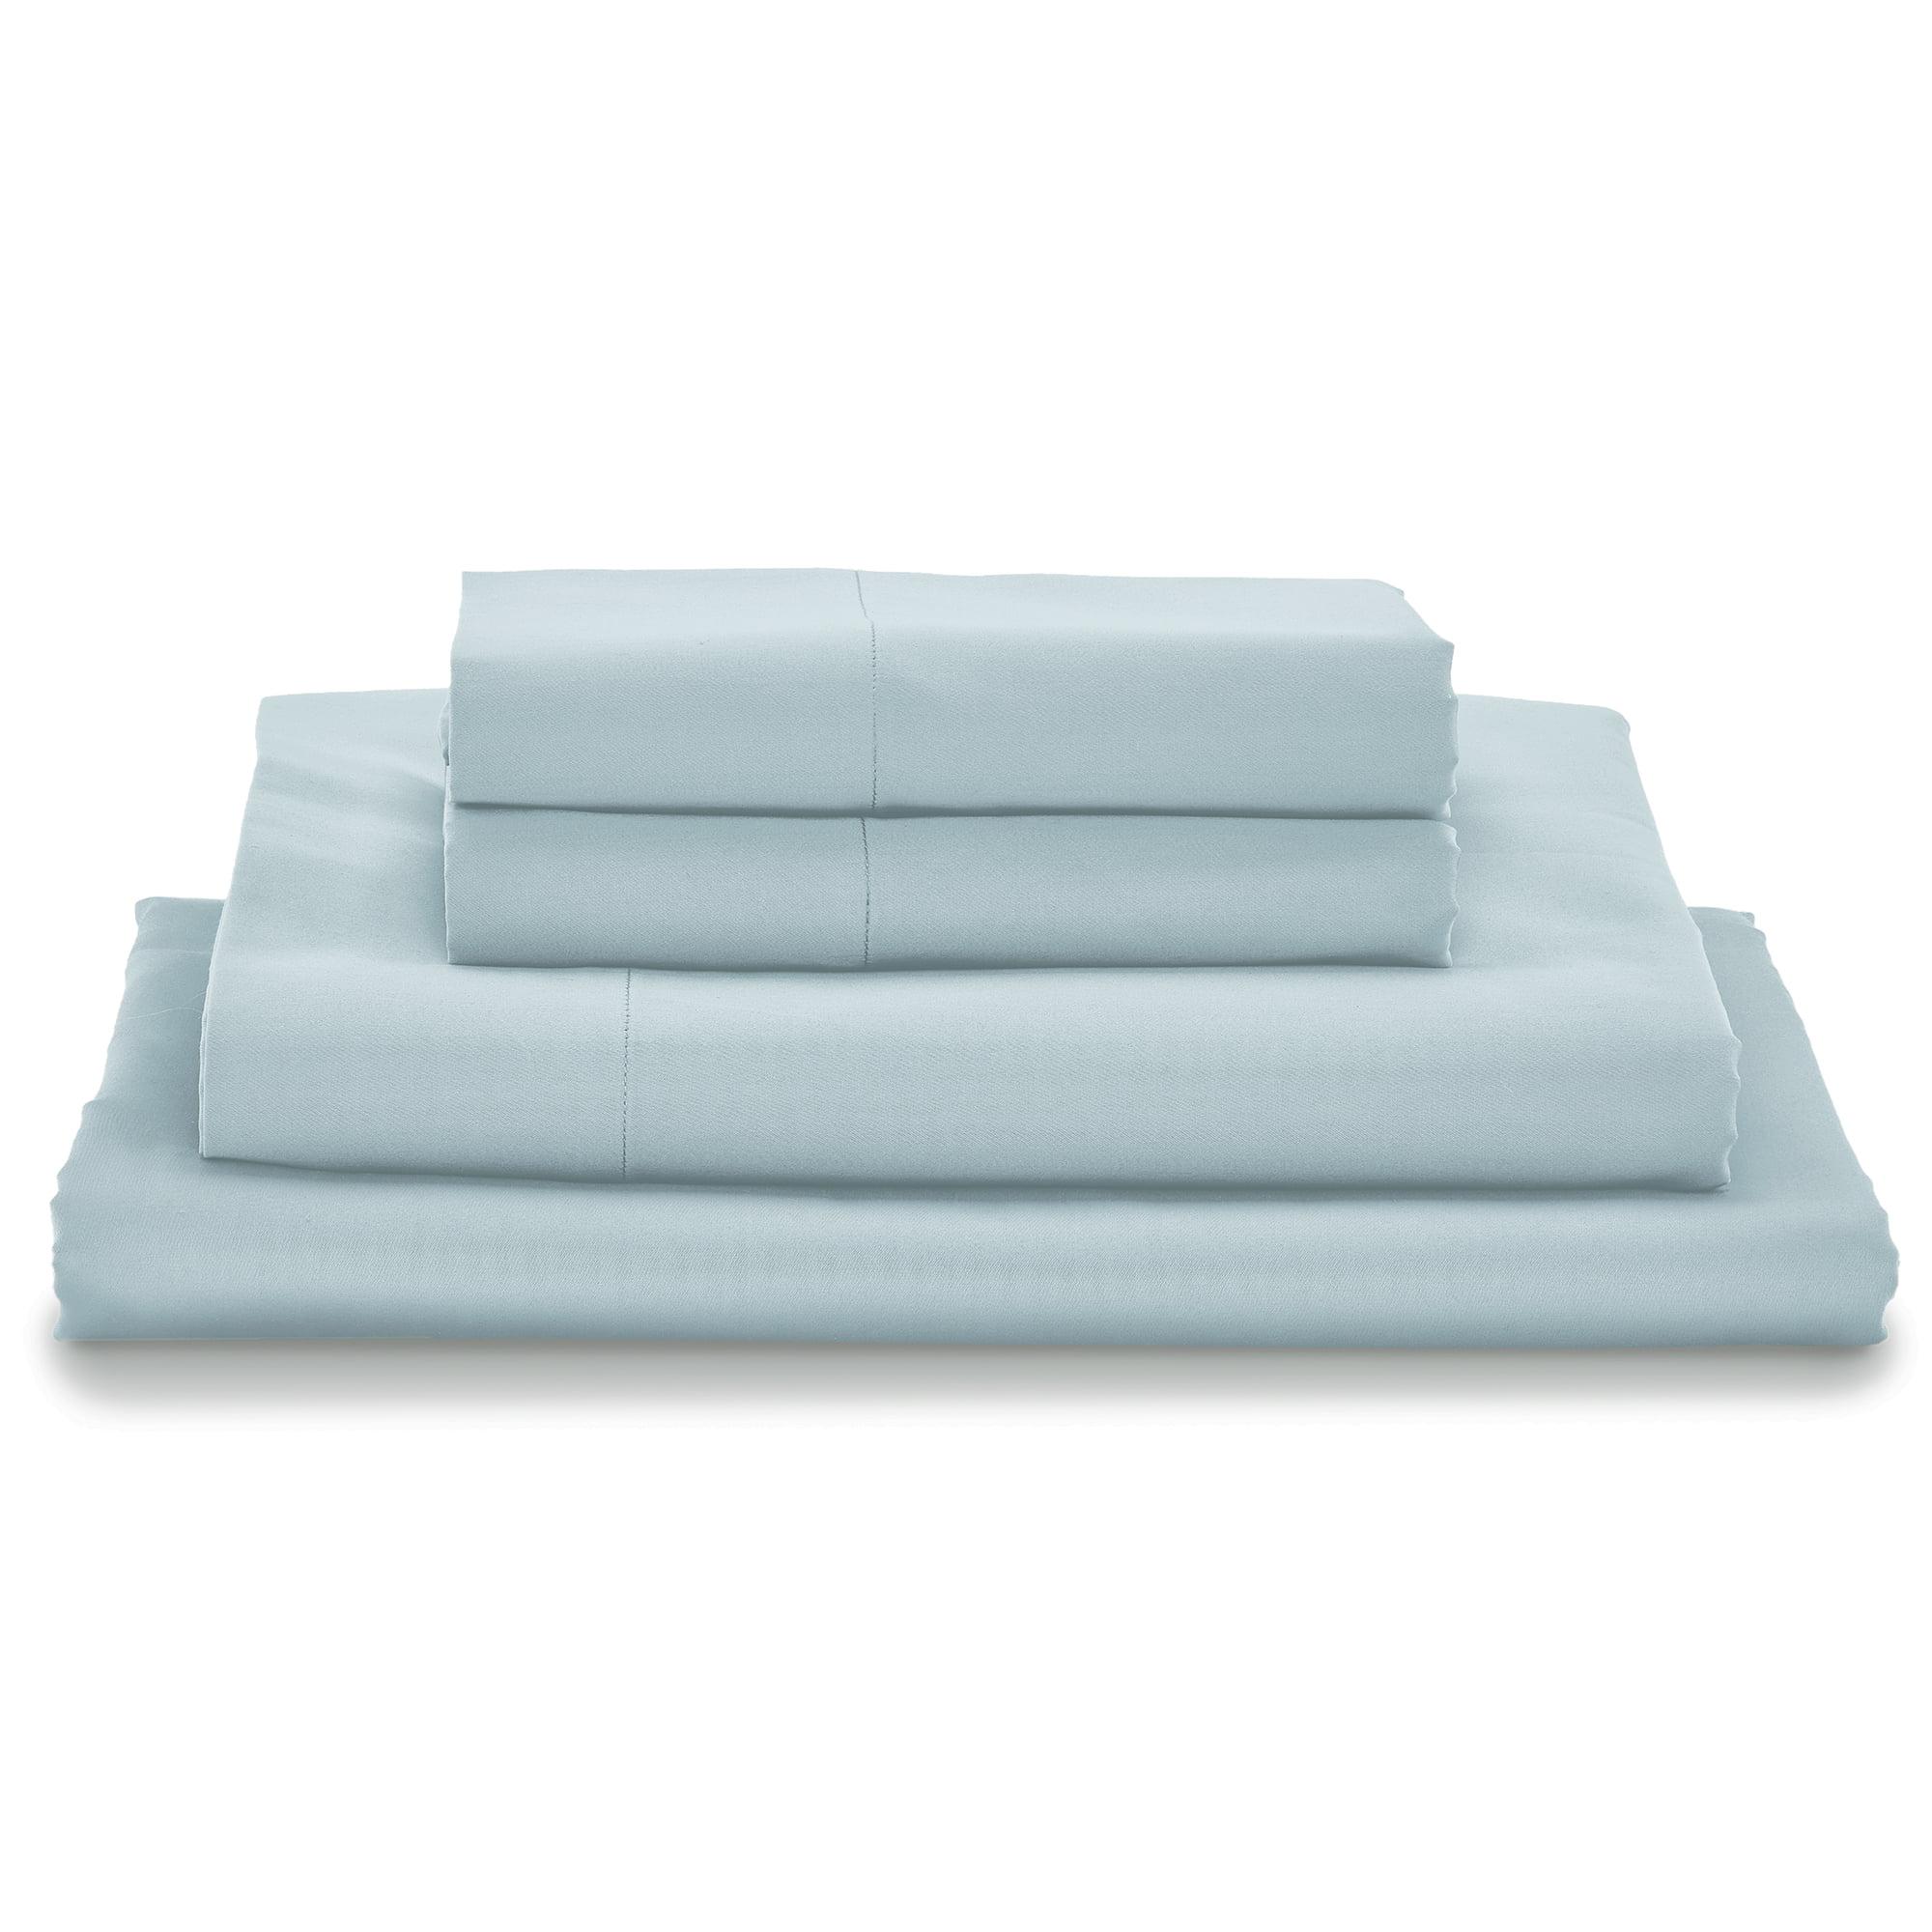 my pillow bed sheets king light blue long staple cotton giza dreams bed sheet set